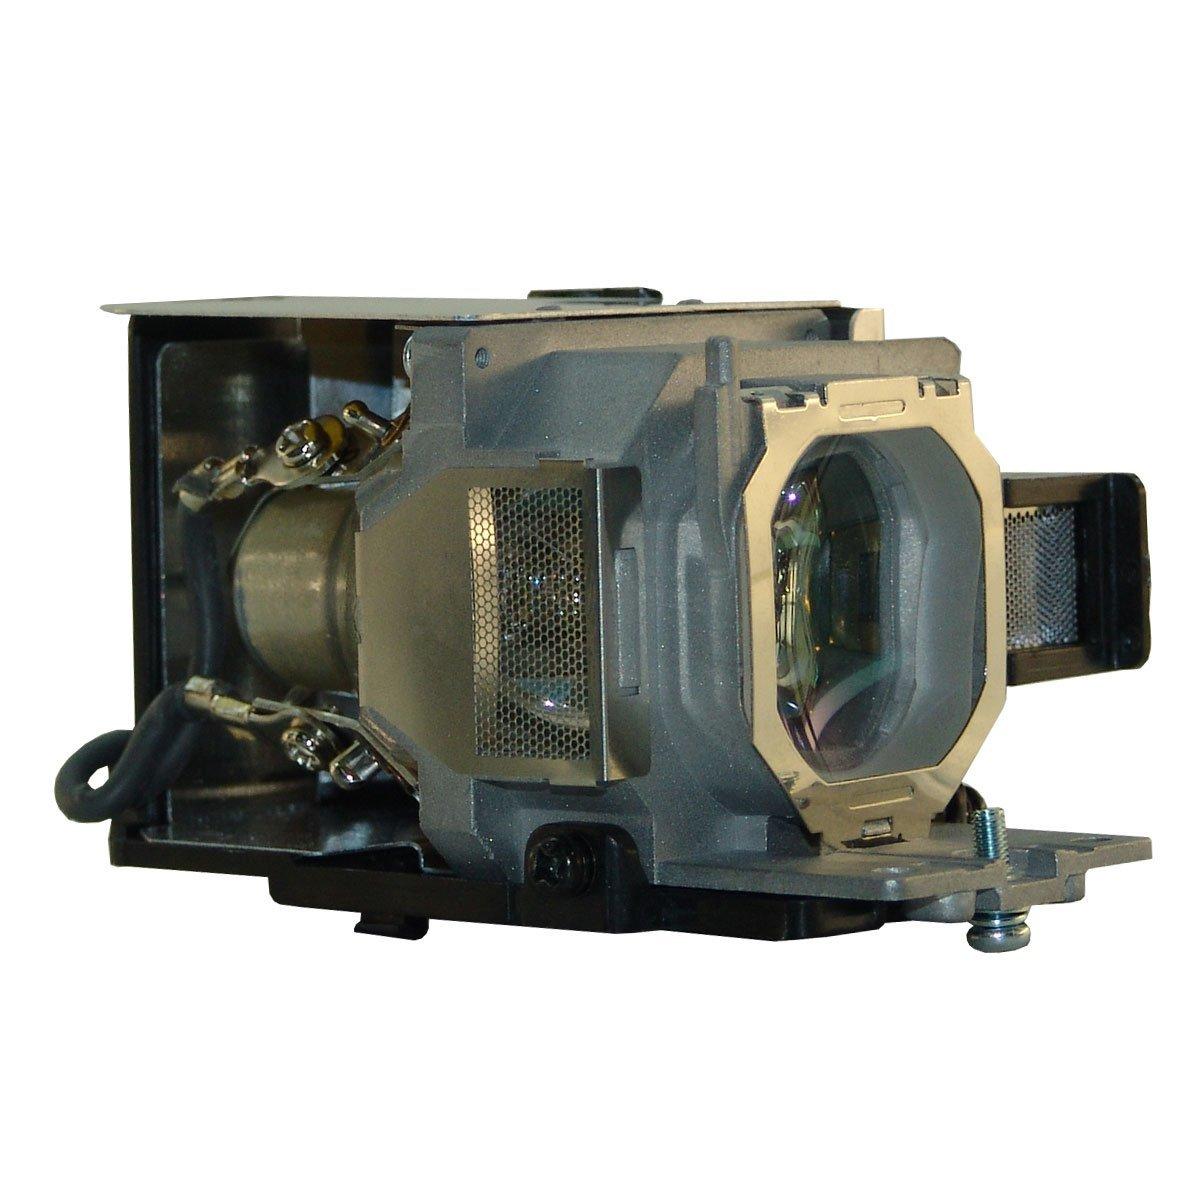 LMP-D200 LMPD200 for Sony VPL-DX10 VPL-DX11 VPL-DX15 Projector Bulb Lamp with housing original replacement projector lamp bulb lmp f272 for sony vpl fx35 vpl fh30 vpl fh35 vpl fh31 projector nsha275w